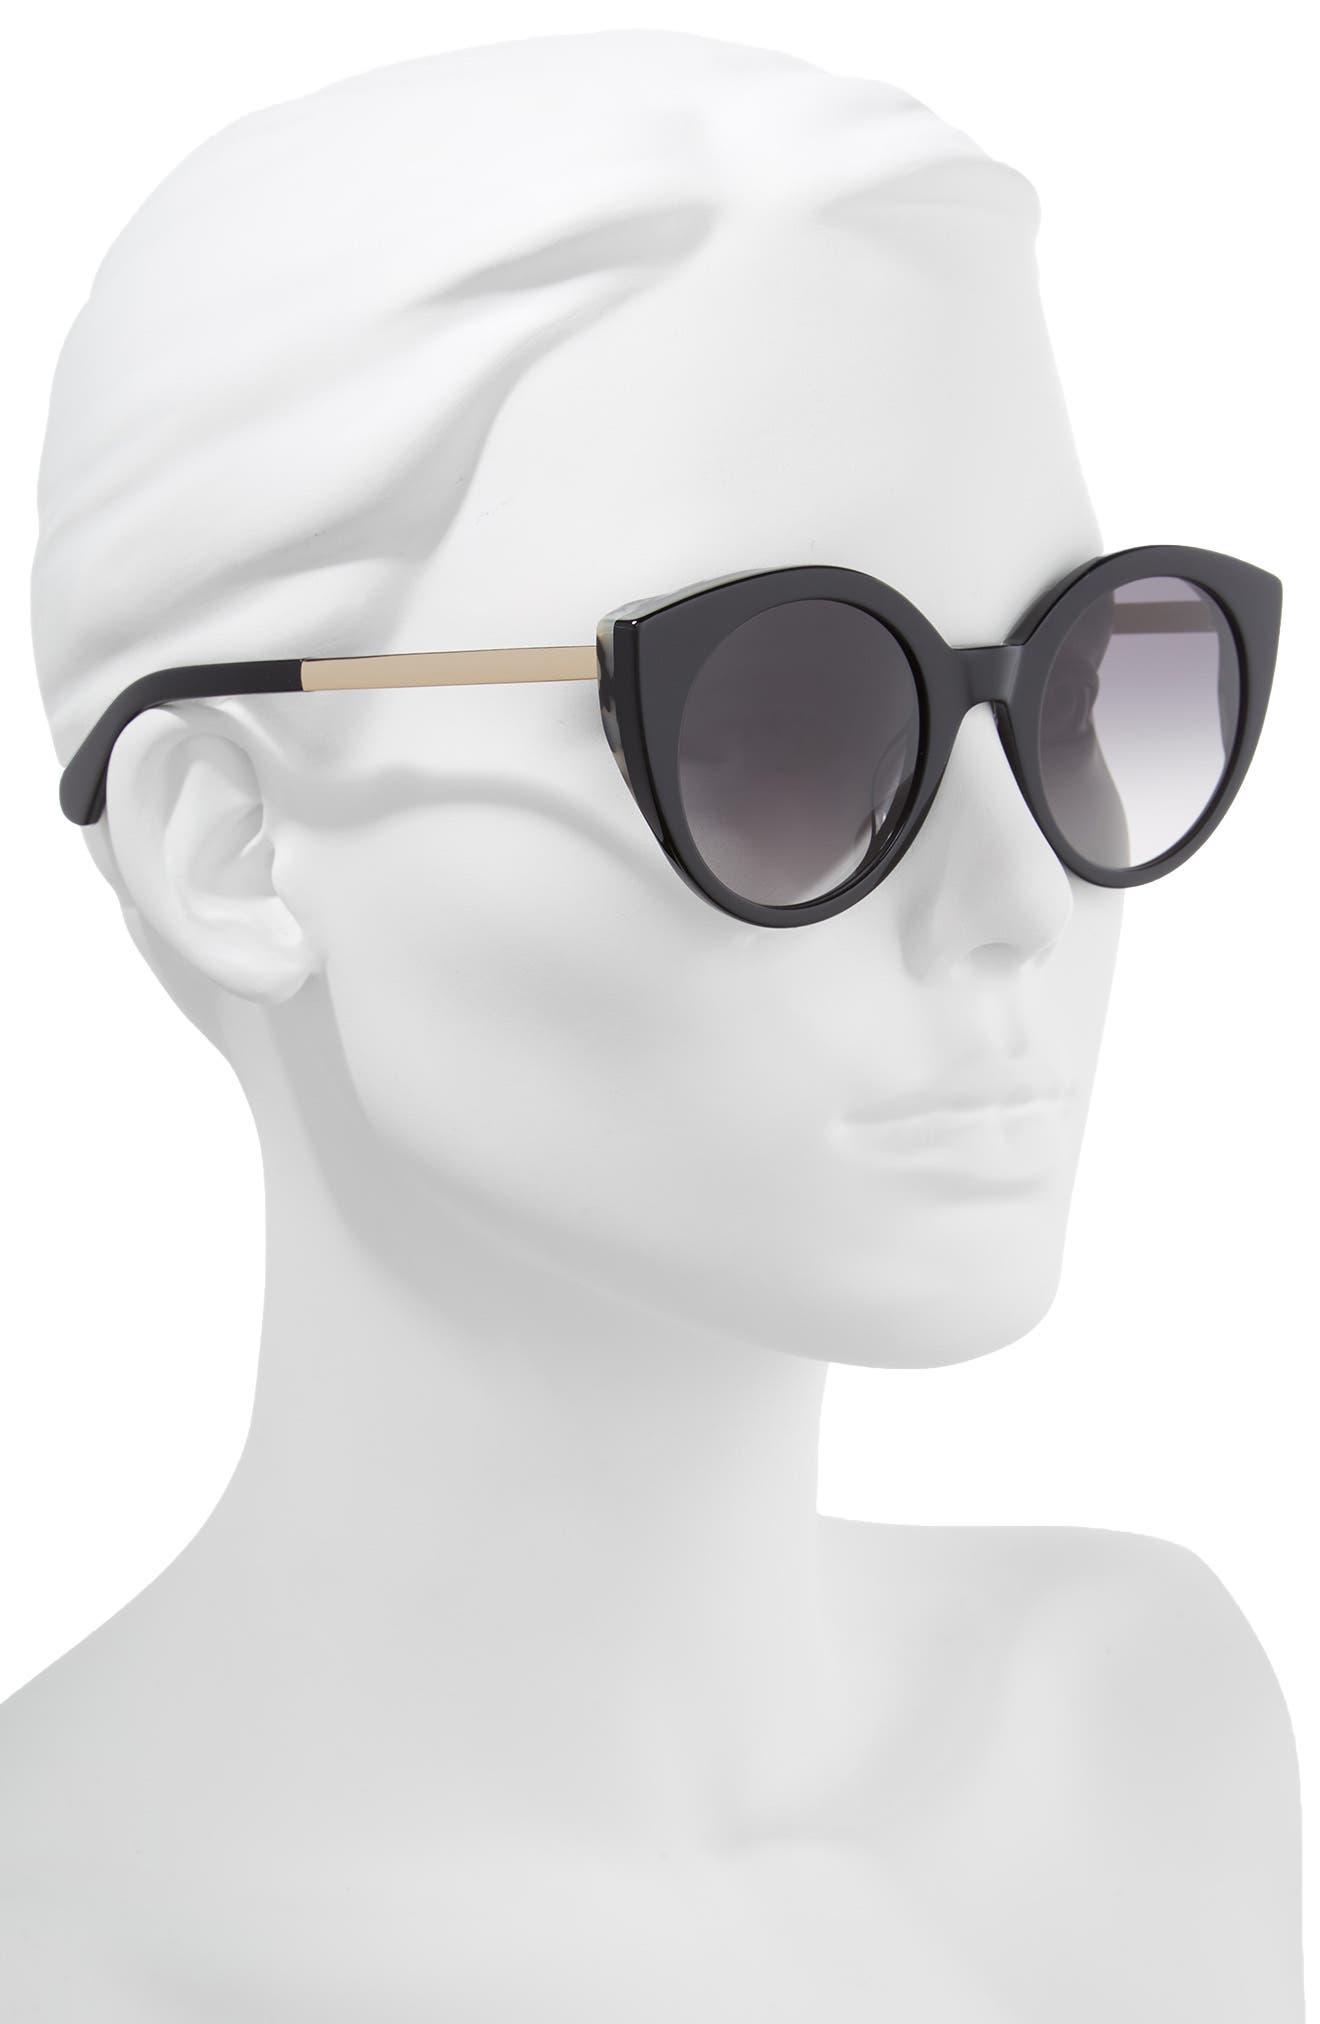 norinas 50mm cat eye sunglasses,                             Alternate thumbnail 2, color,                             Black